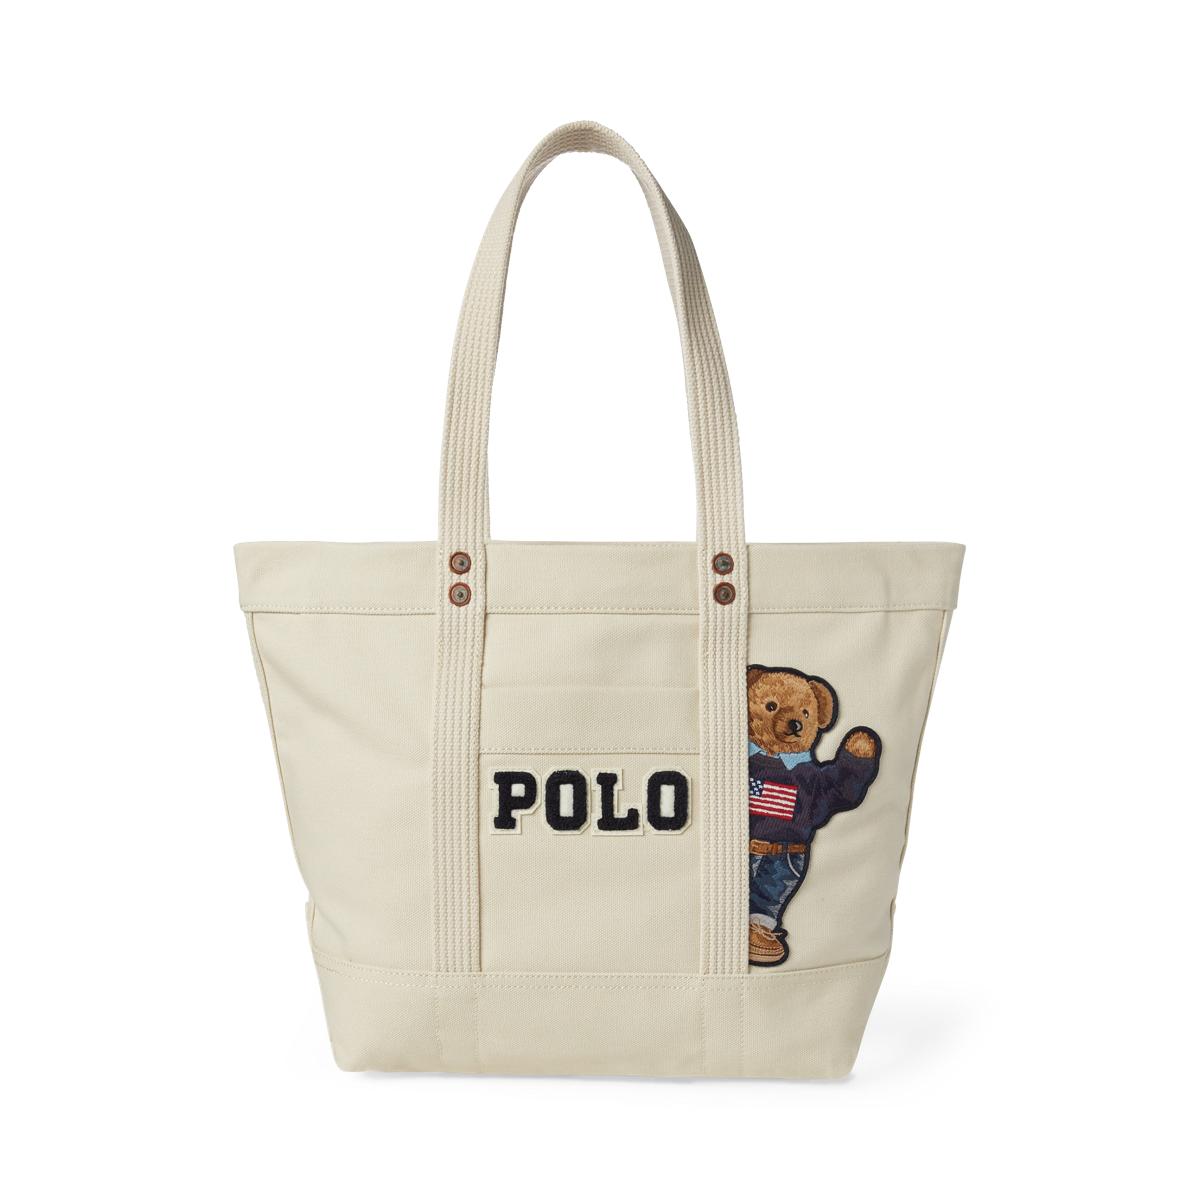 Polo Handbags Online Malaysia